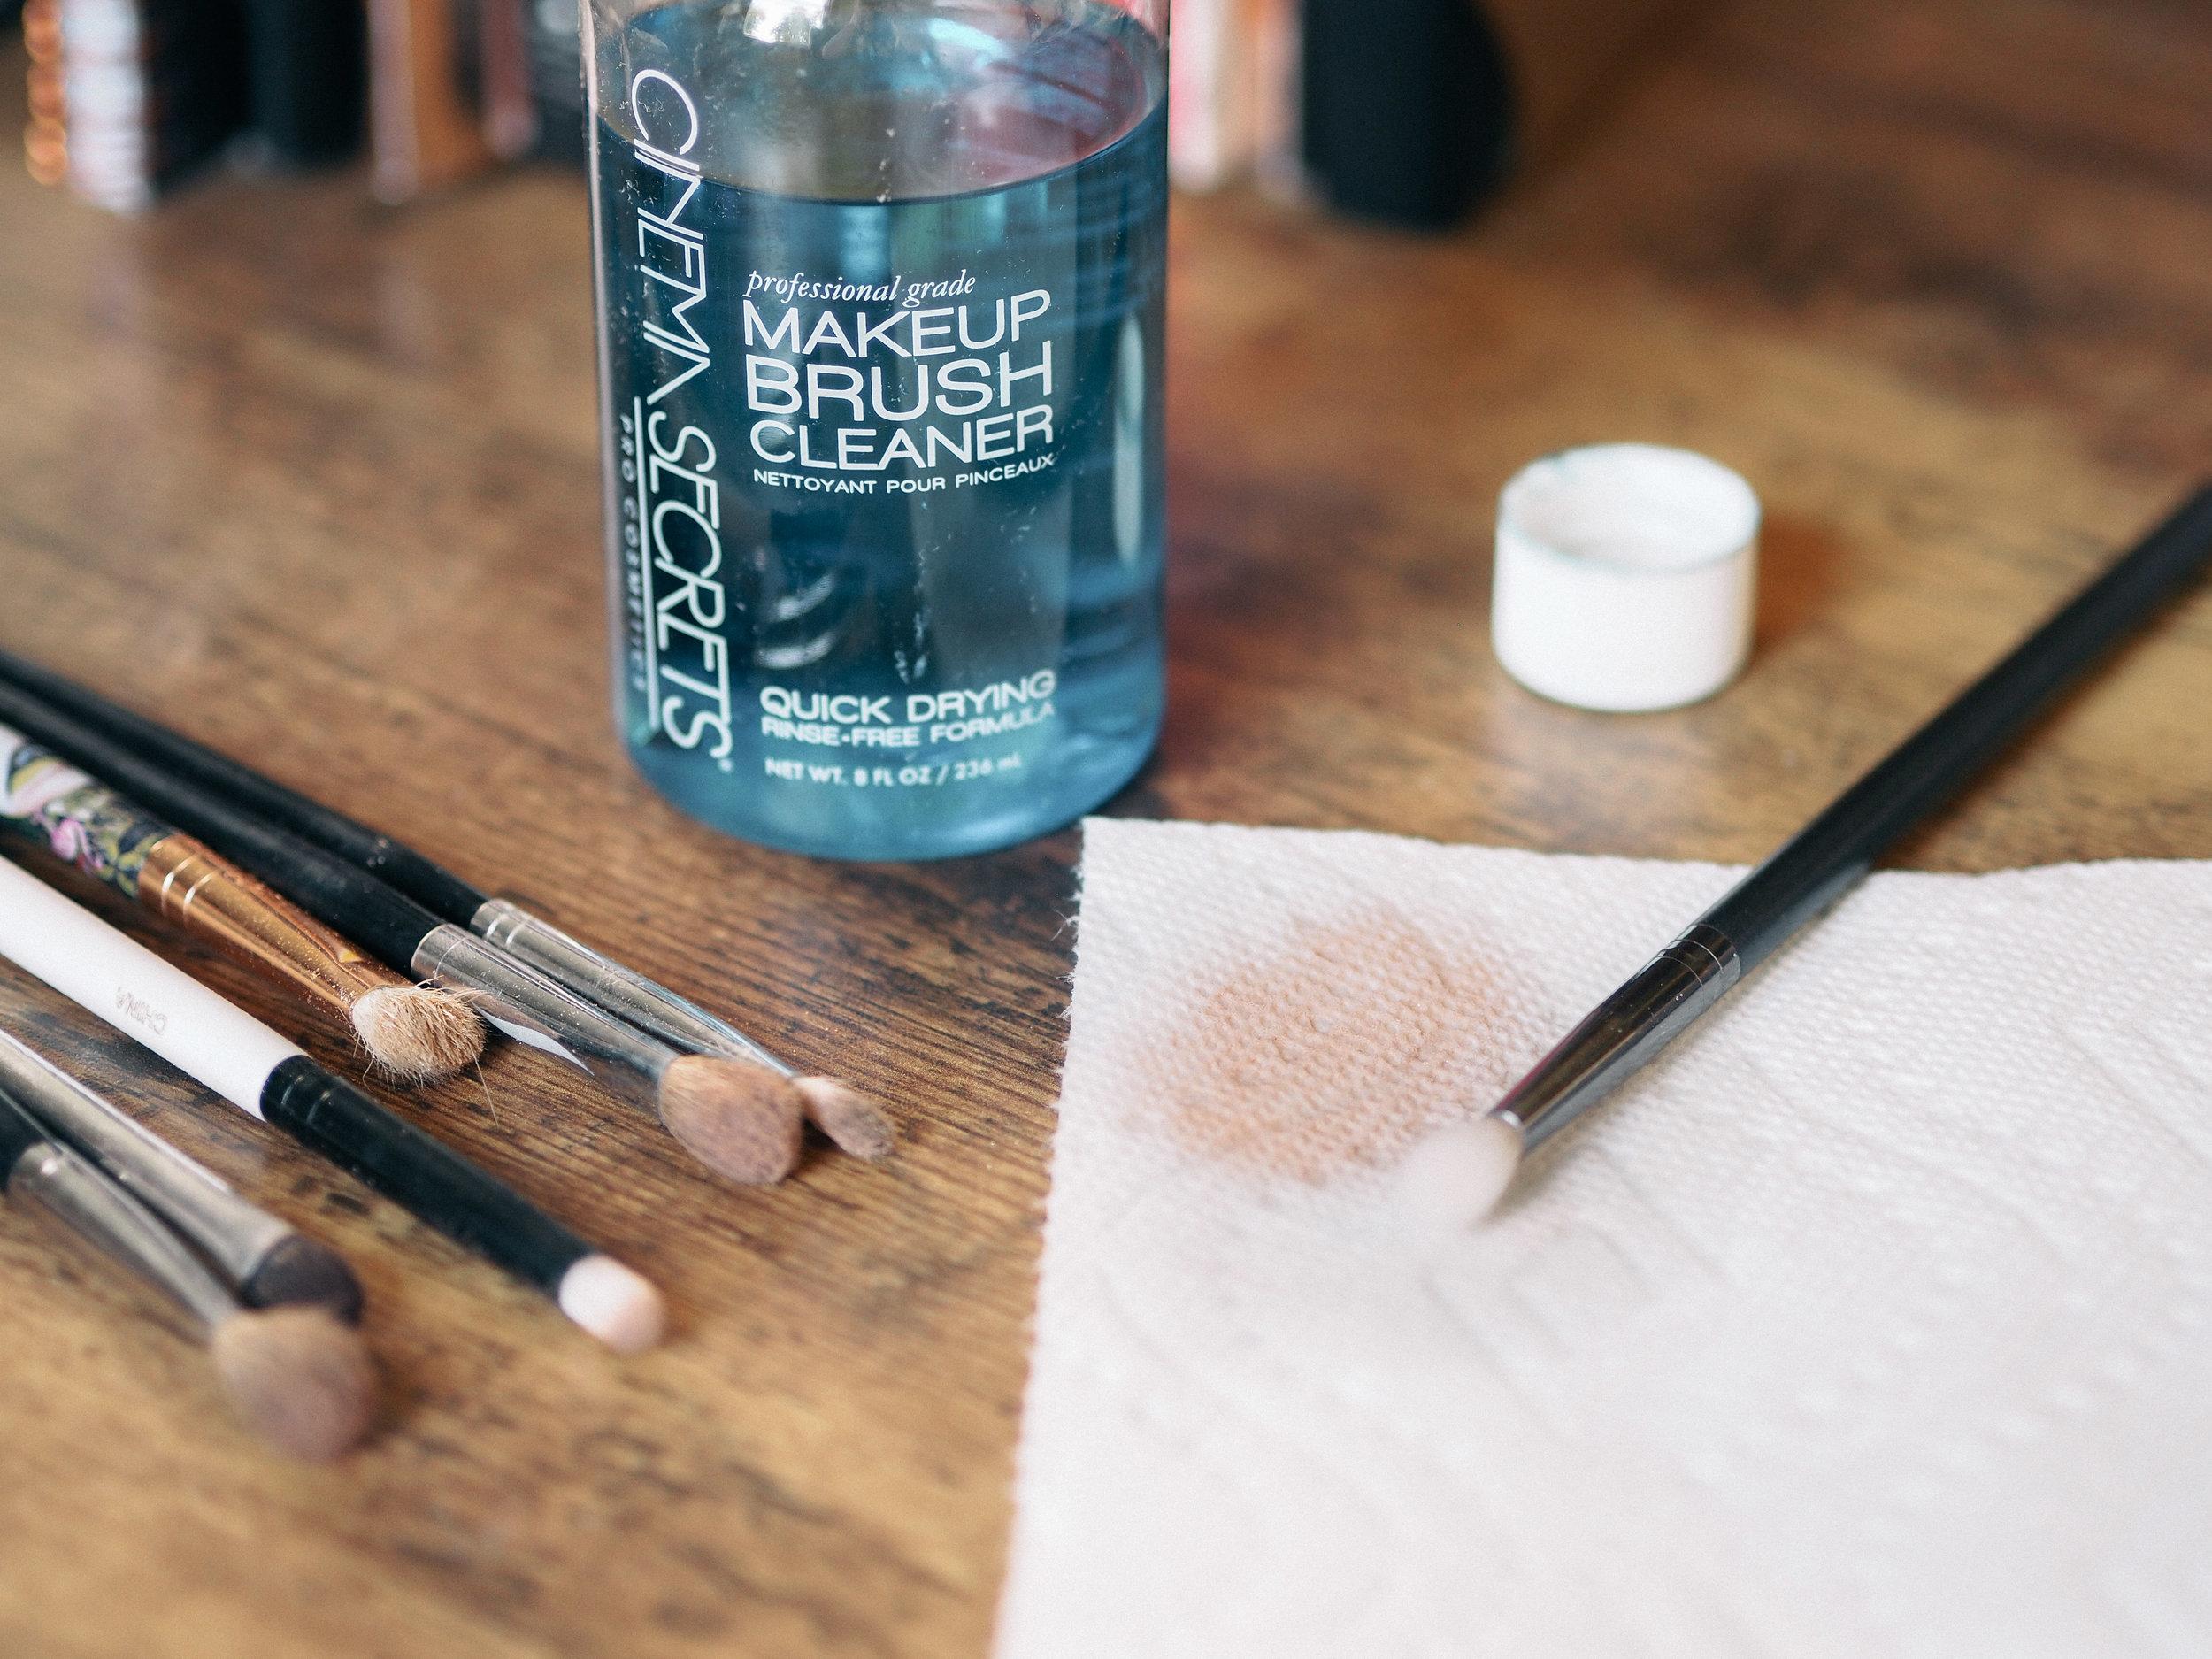 cinema-secrets-makeup-brush-cleaner-review-4.jpg